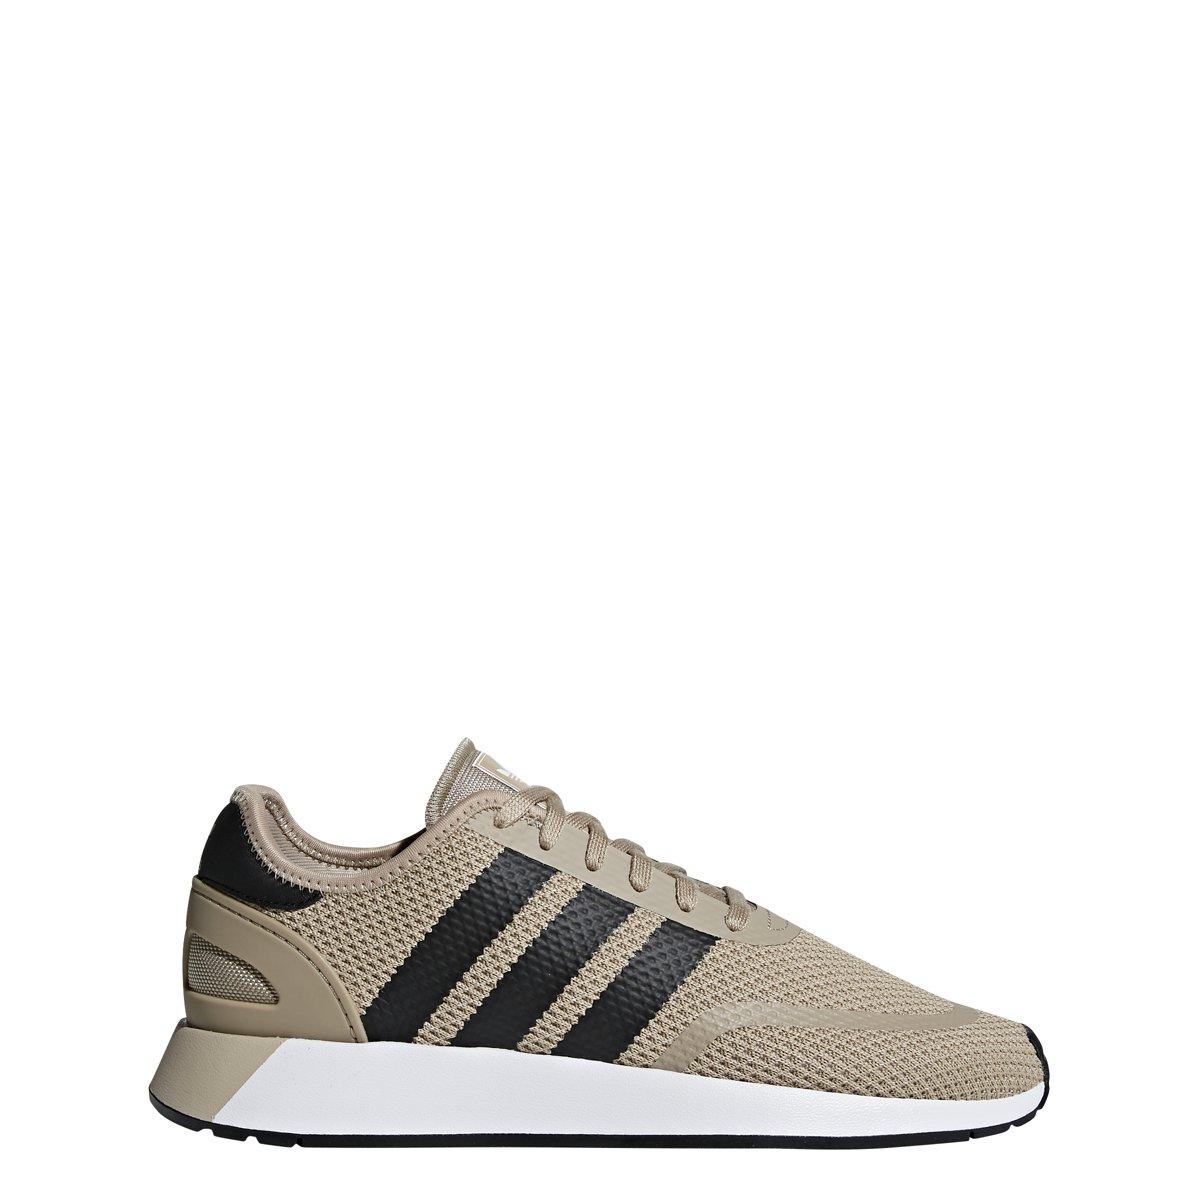 Adidas Men's N-5923 Sneaker B077XCNYP5 11.5 D(M) US Trace Khaki/Black/White